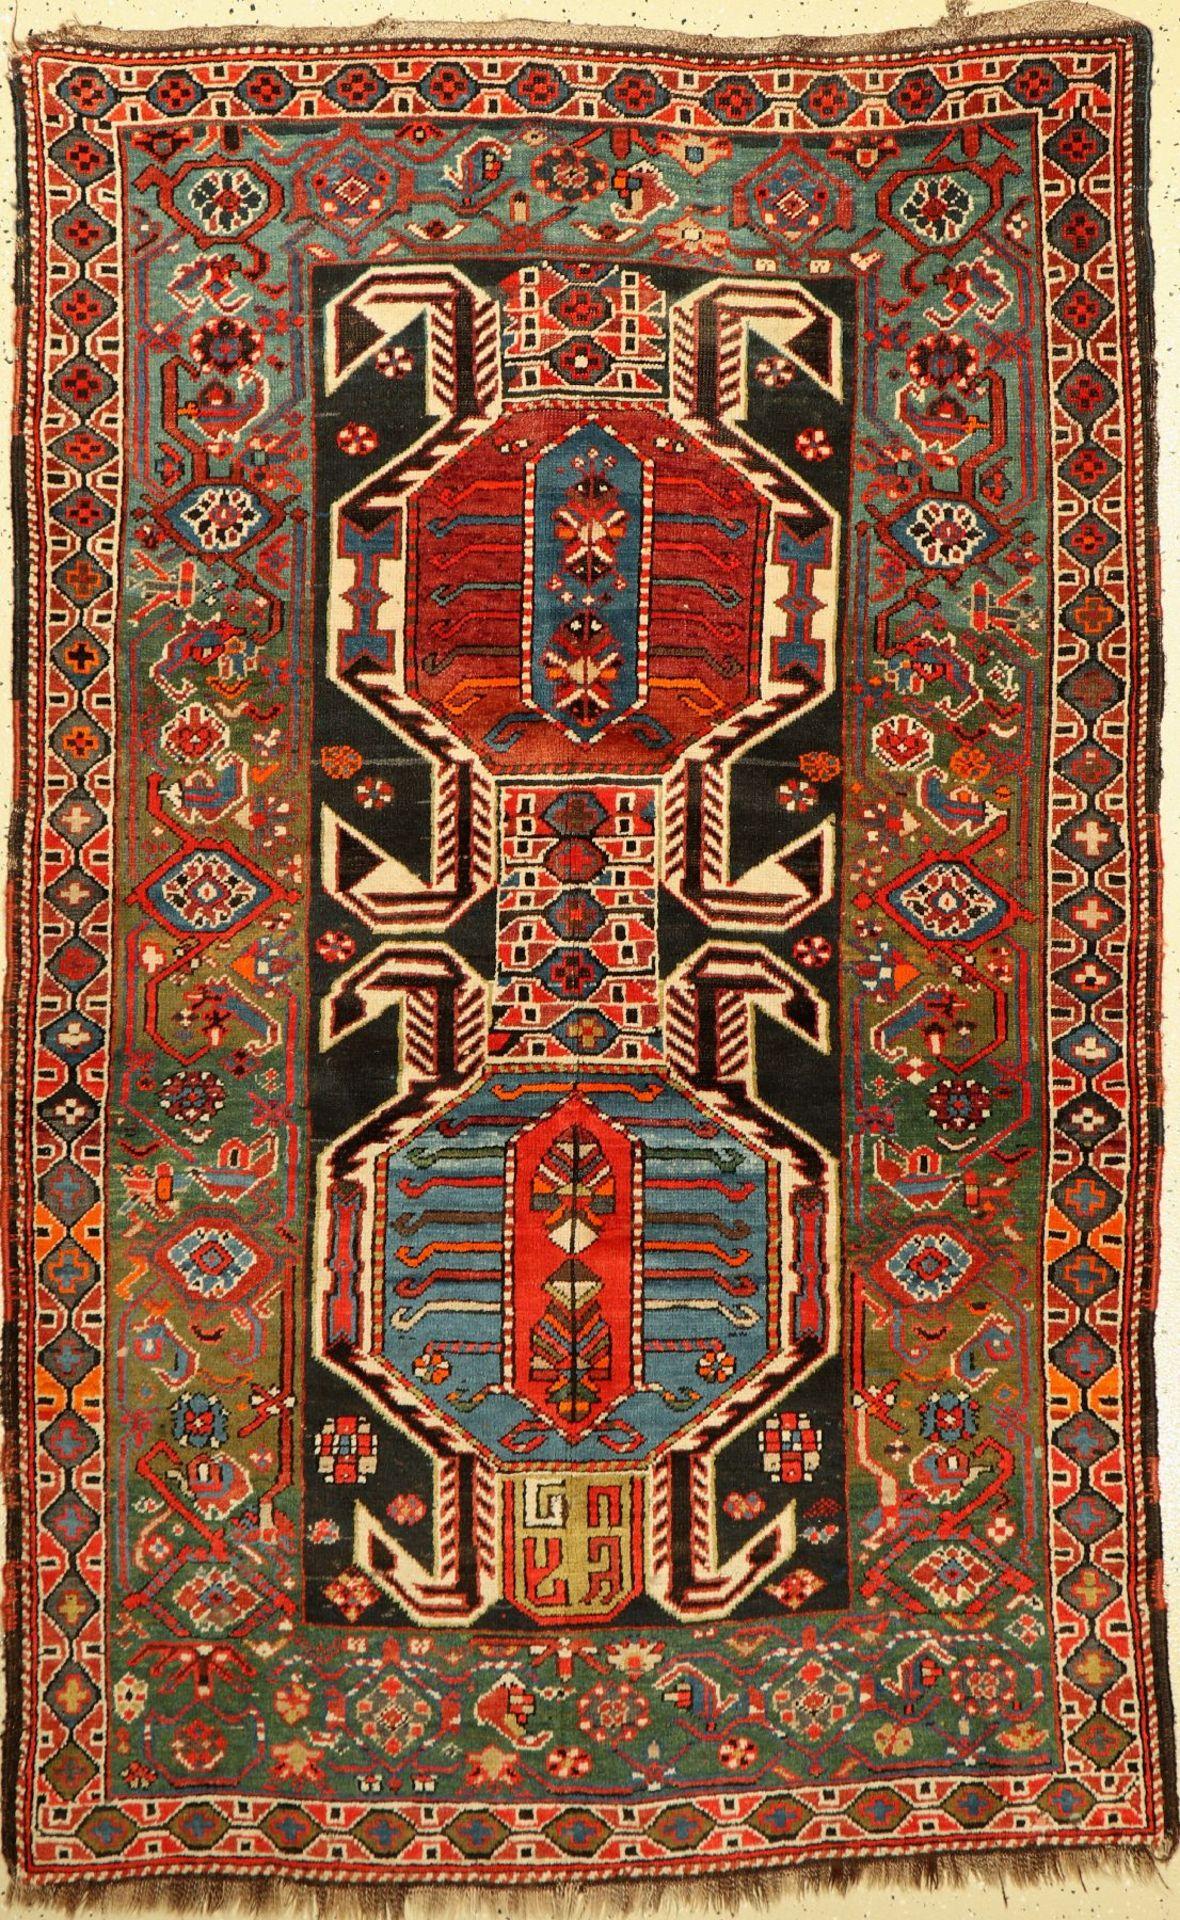 Azerbaijan (Lenkoran Muster), alt, Persien/Kaukasus, um 1930, Wolle auf Wolle, ca. 194 x 123 cm,